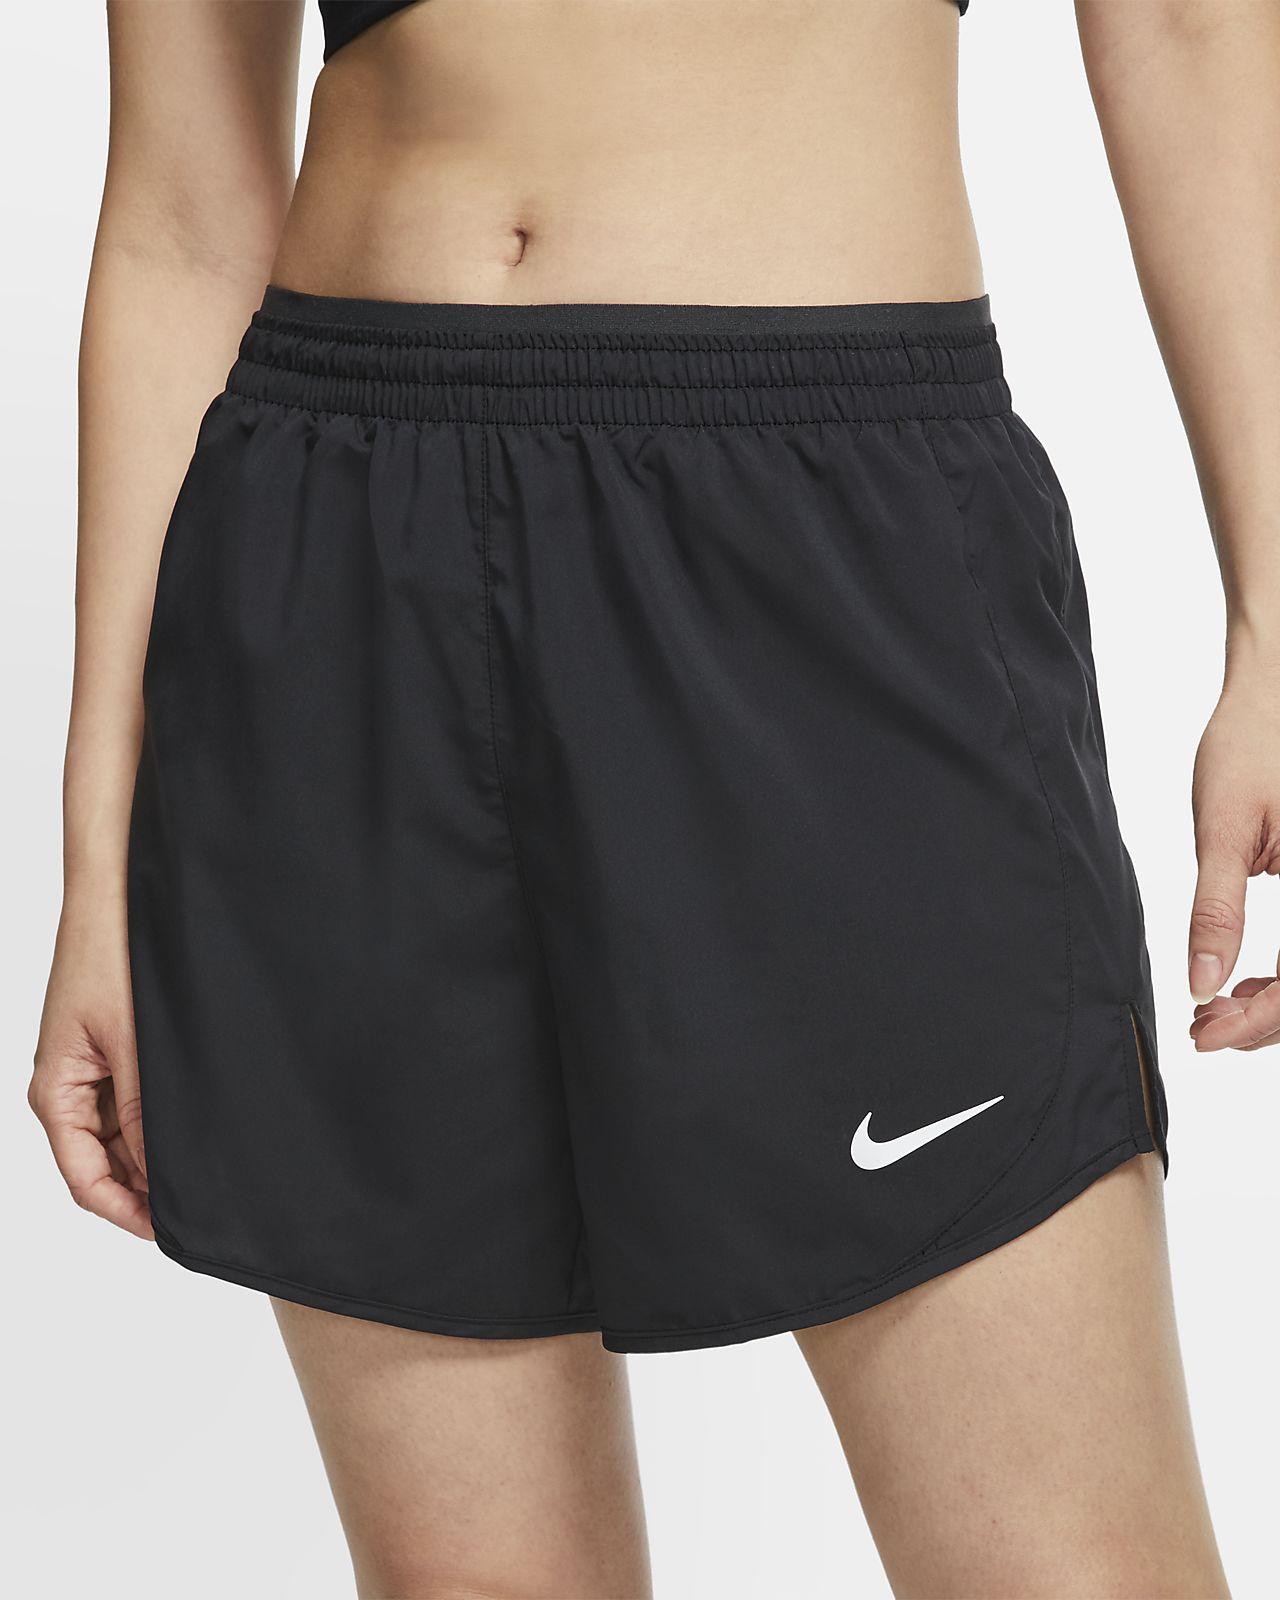 Nike Tempo Luxe-løbeshorts til kvinder